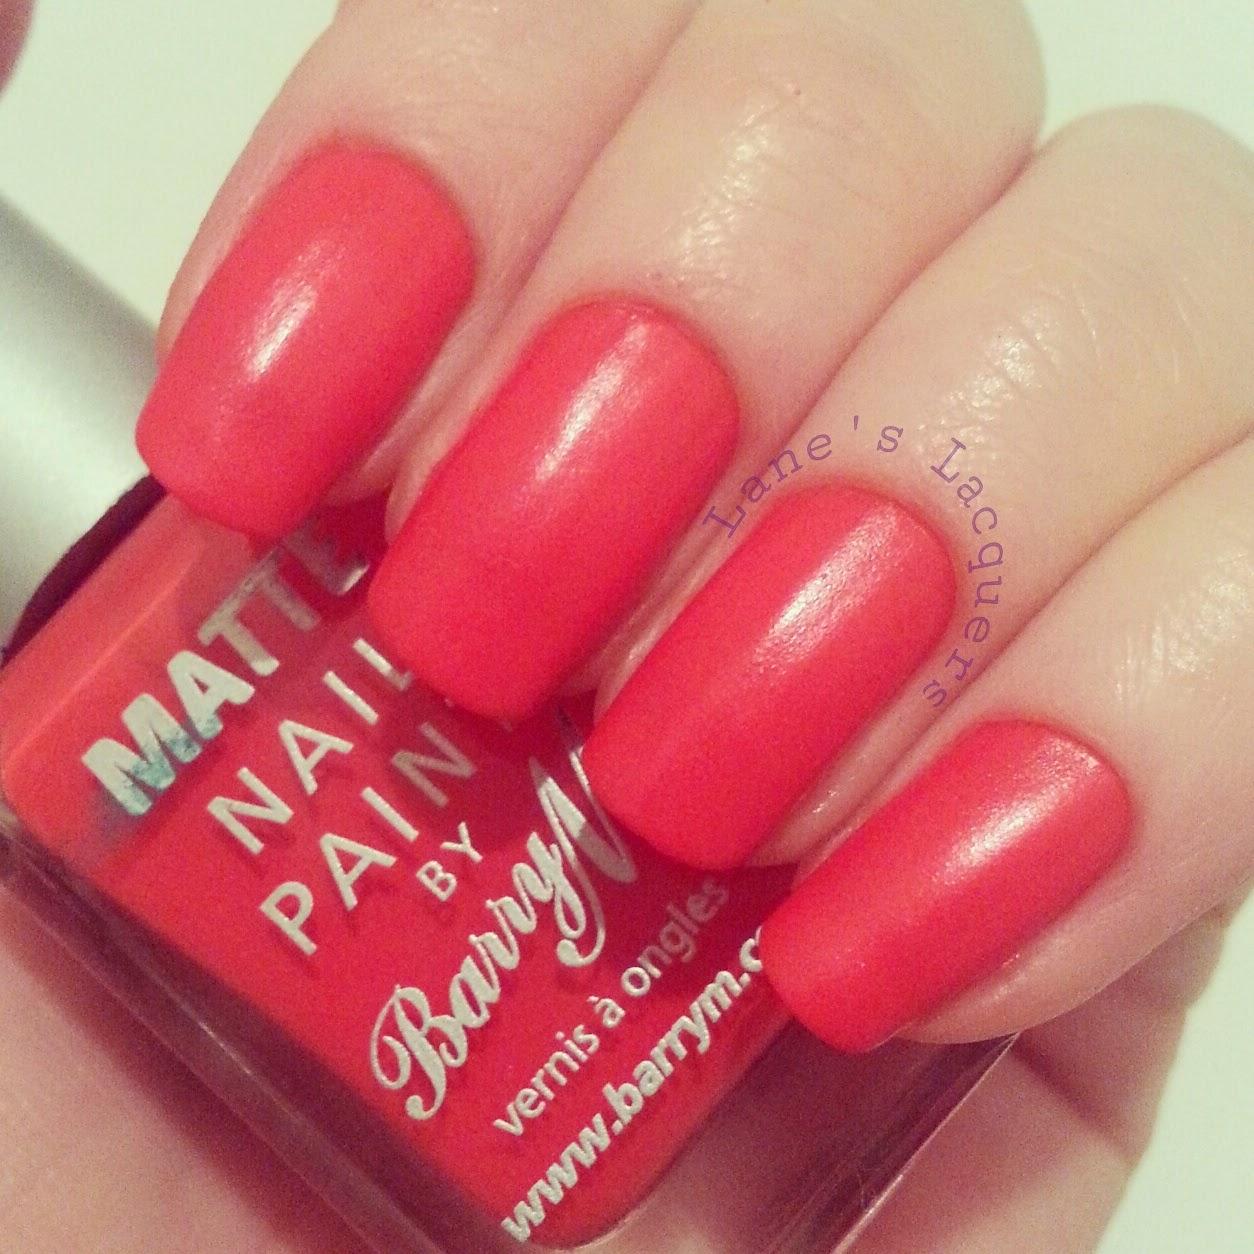 barry-m-copacabana-swatch-manicure (2)